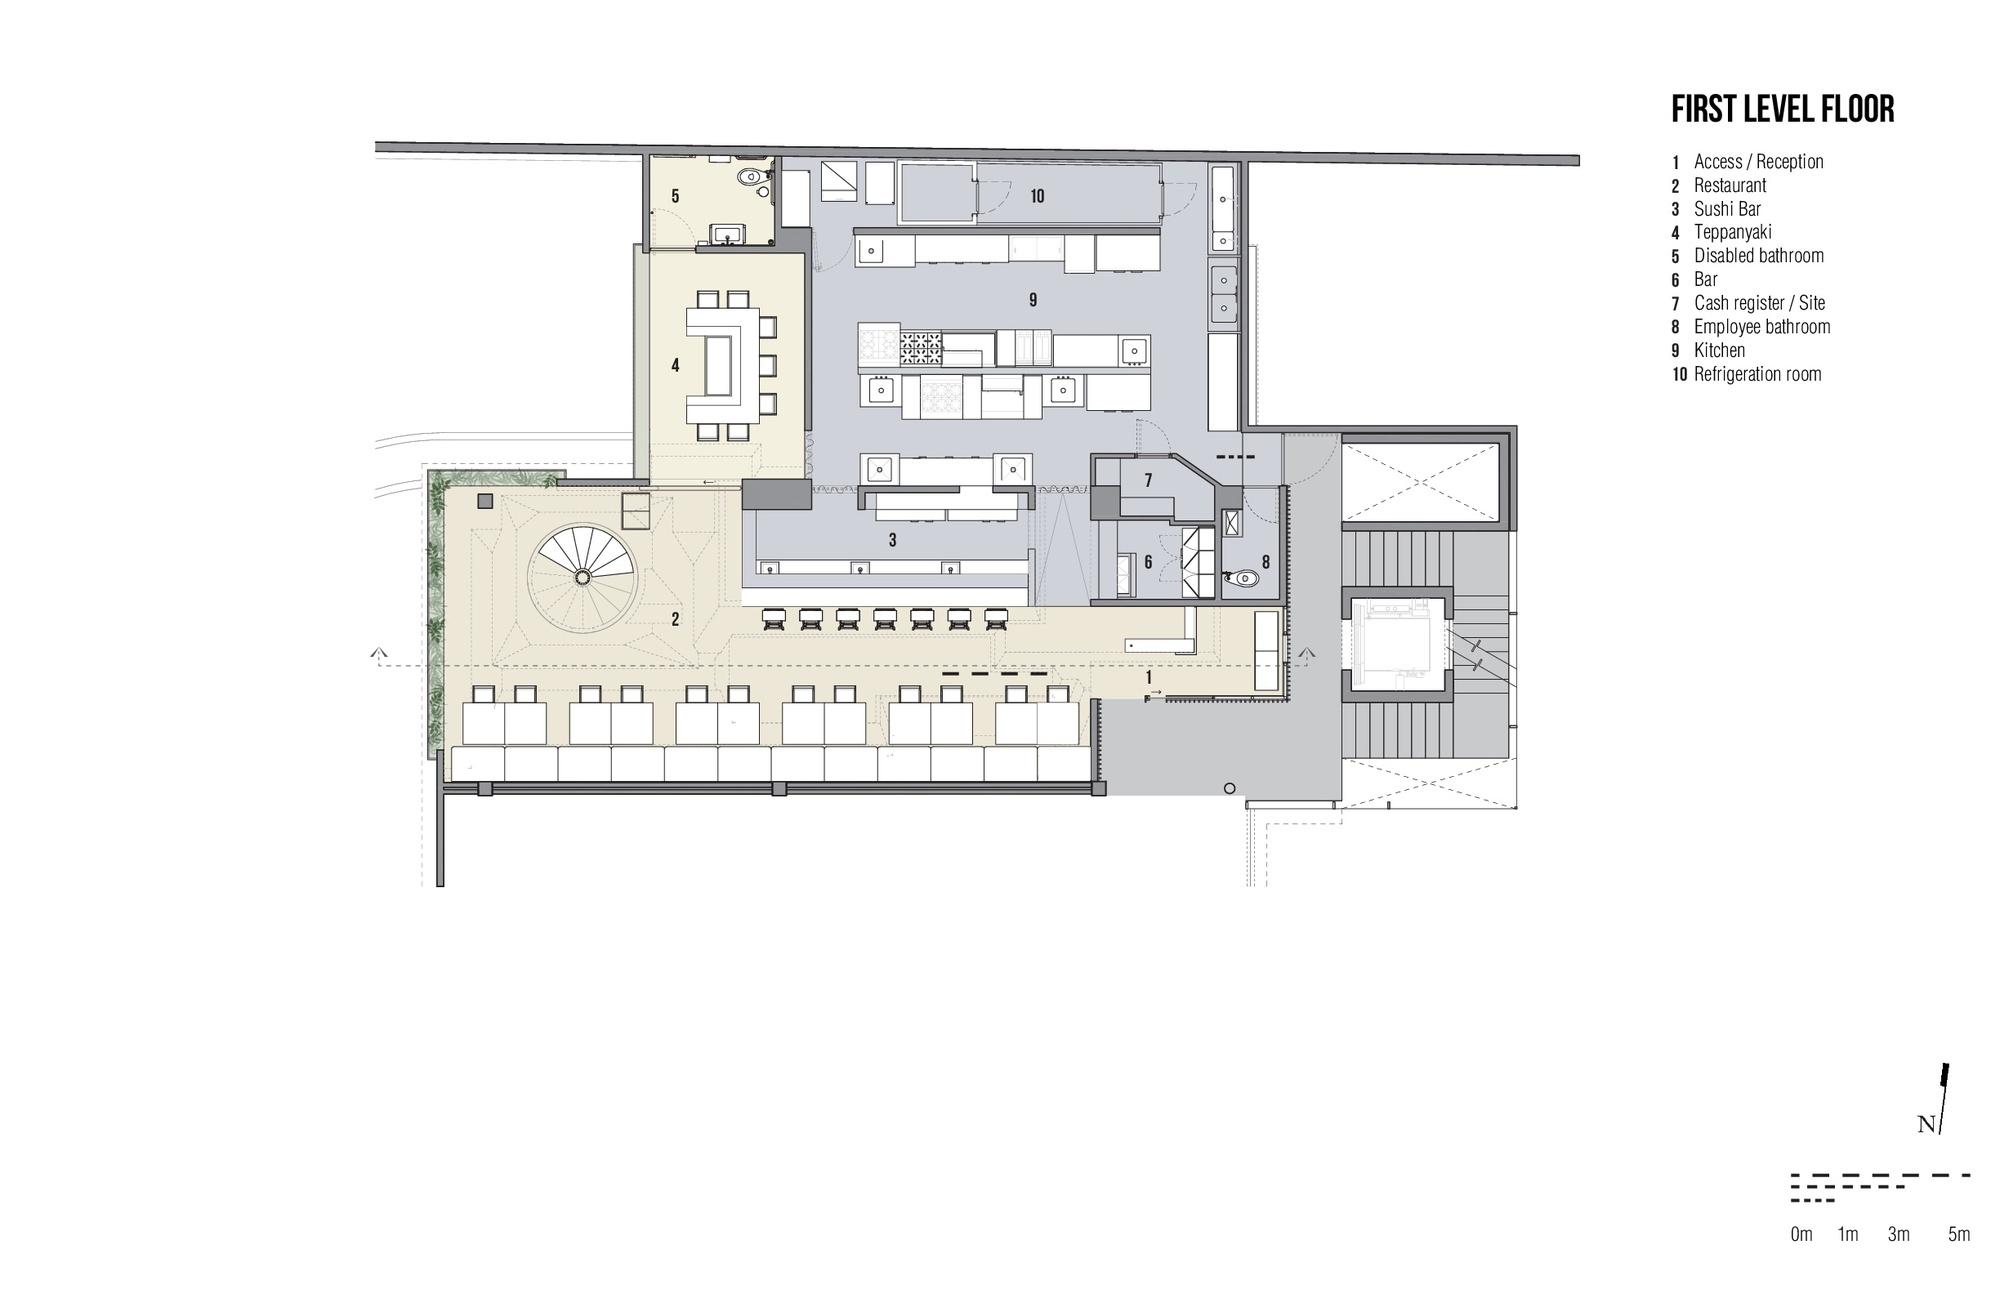 gallery of tori tori altavista esrawe studio rojkind first level floor plan